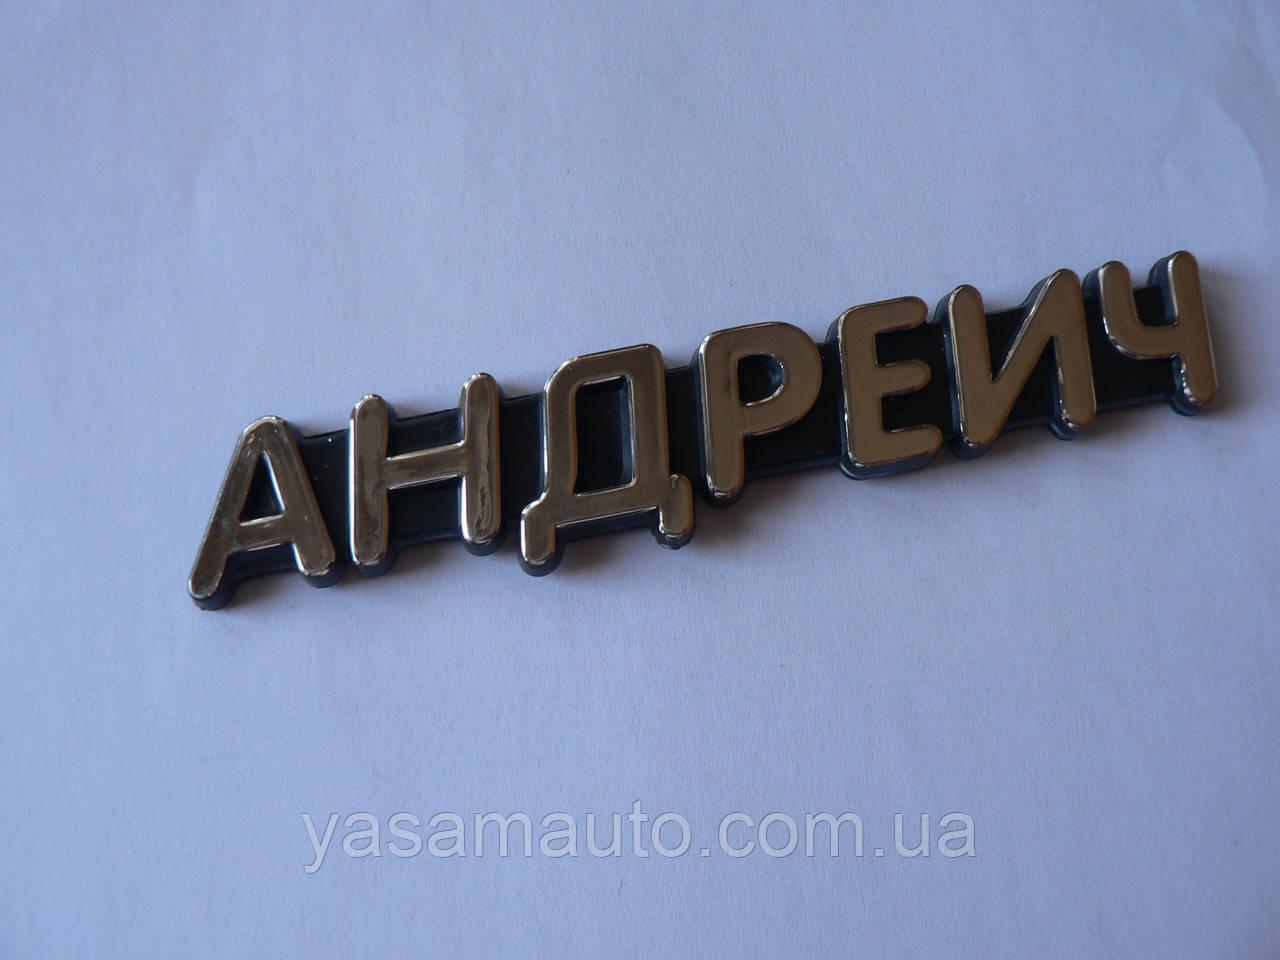 Наклейка pp имя отчество Андреич 126х24х4мм мужское пластик буквы надпись задняя на авто мальчика